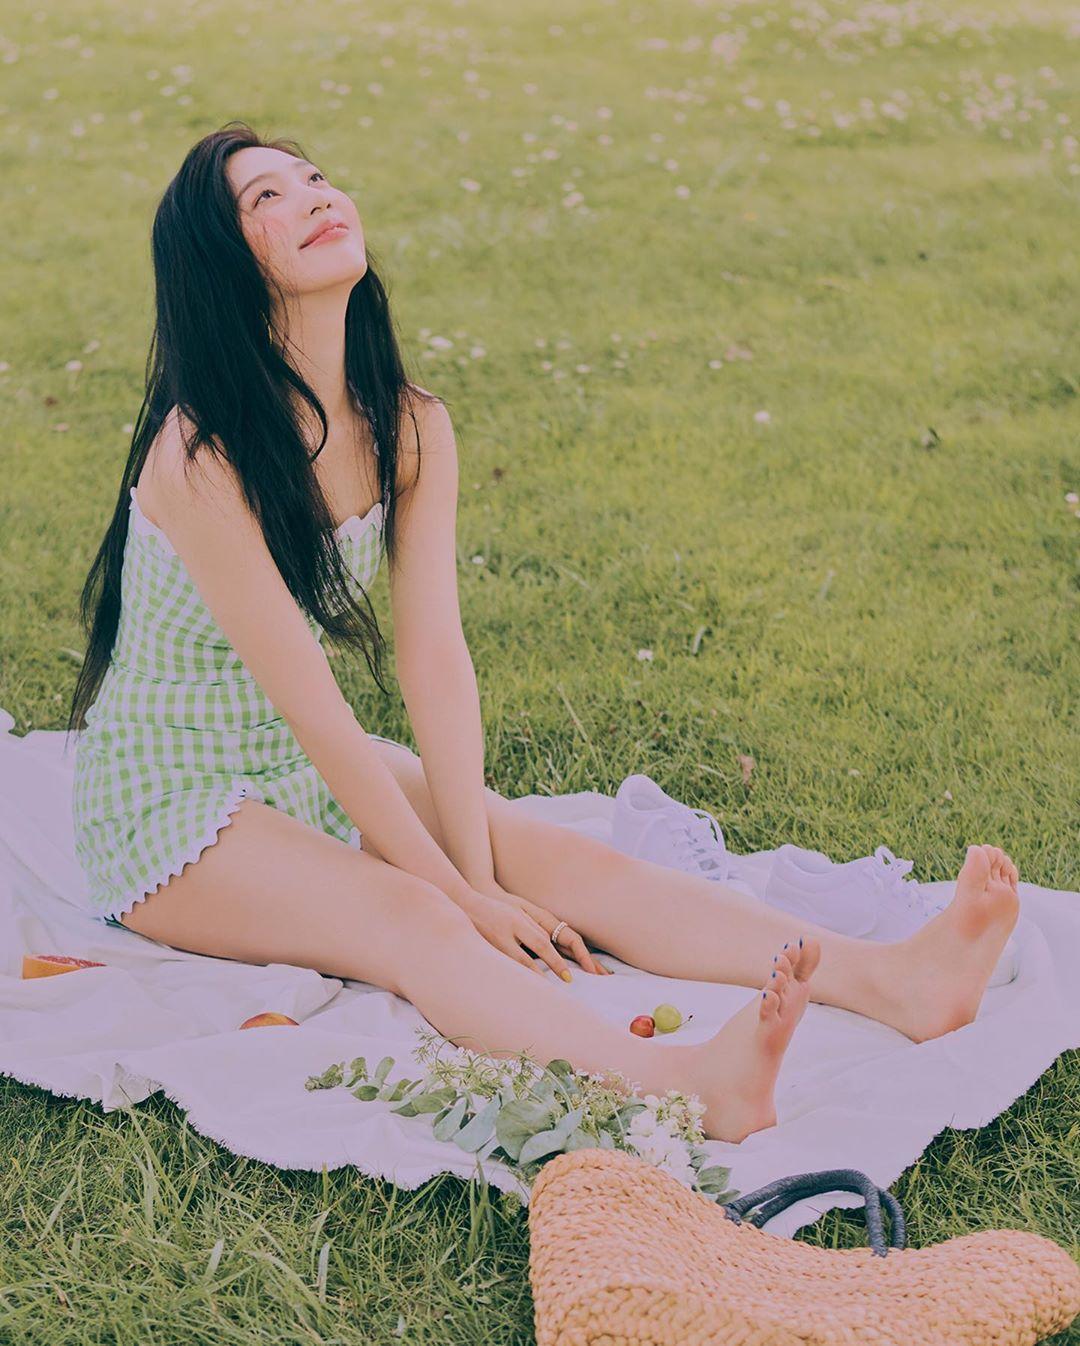 "[Red Velvet][分享]190815 JOY宣传新专预告照""我自己看也觉得很漂亮"""